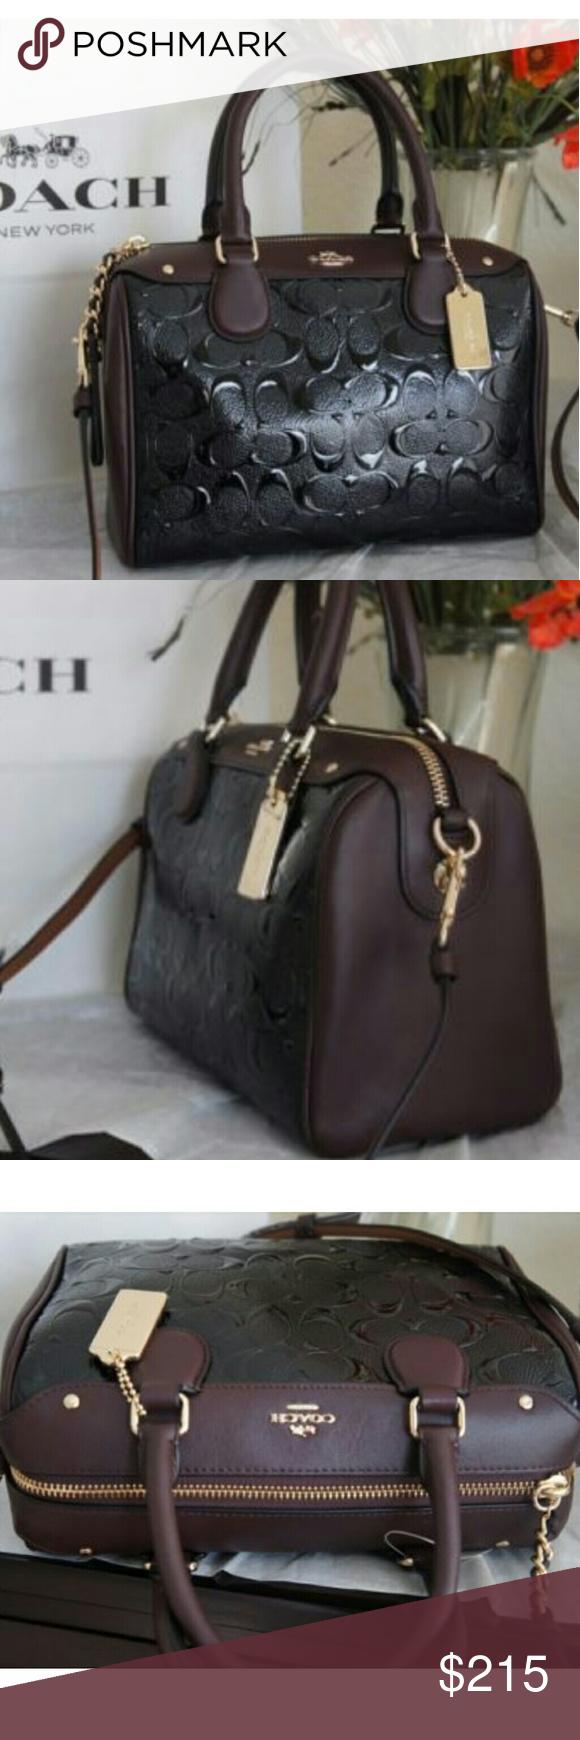 6217e0a89c9c2 Coach Bennett Patent Handbag Coach Mini Bennett Satchel In Signature  Debossed Leather Style  F11920 Color